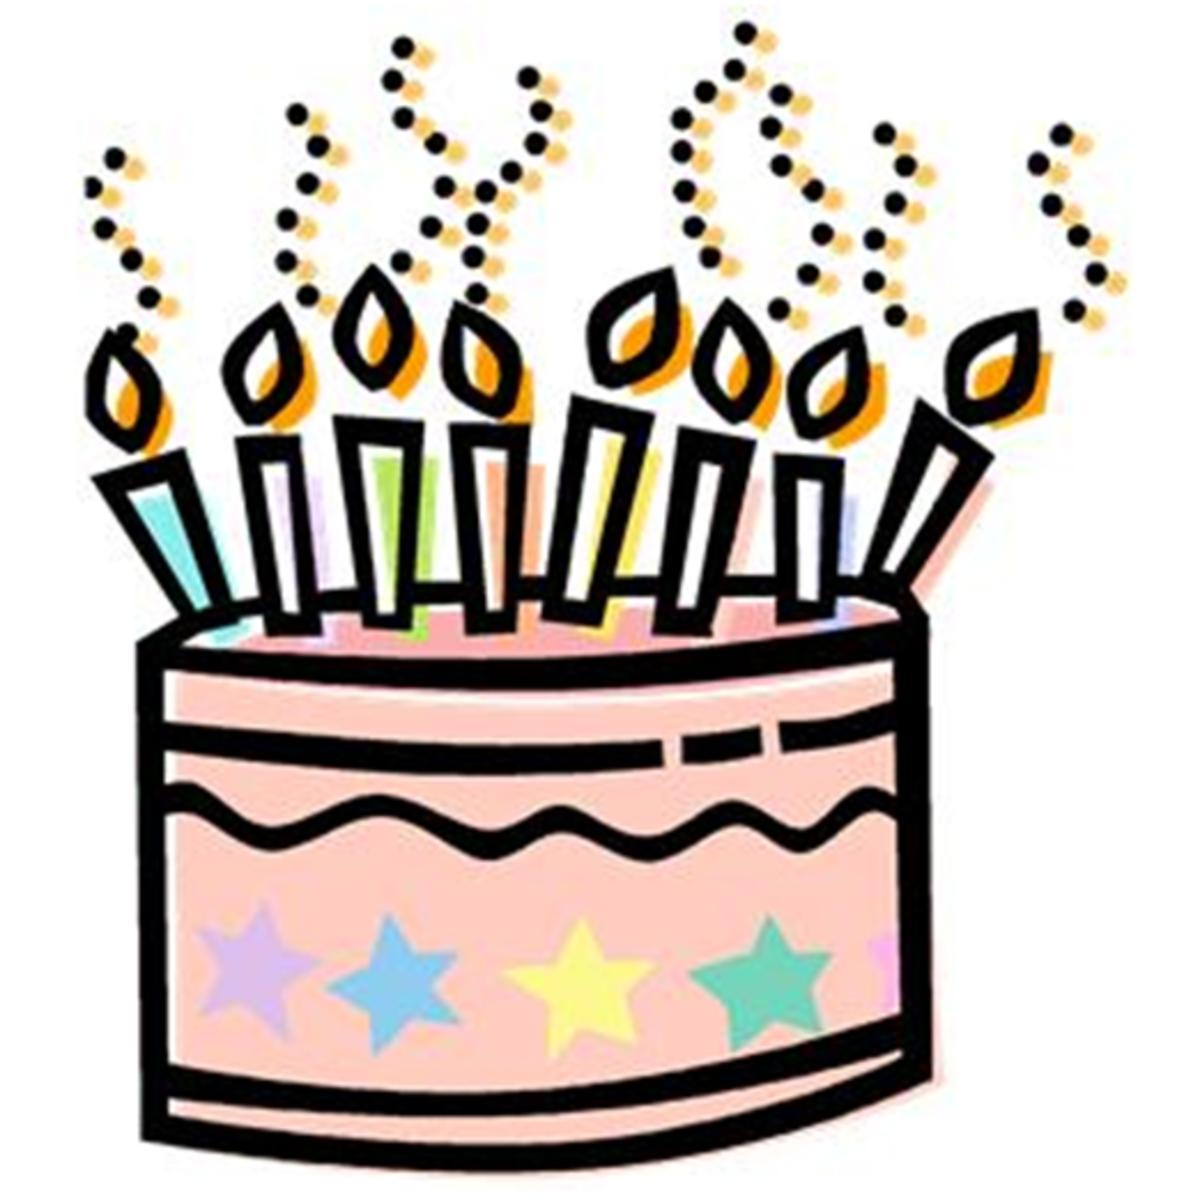 Pink Happy Birthday Cake with Stars